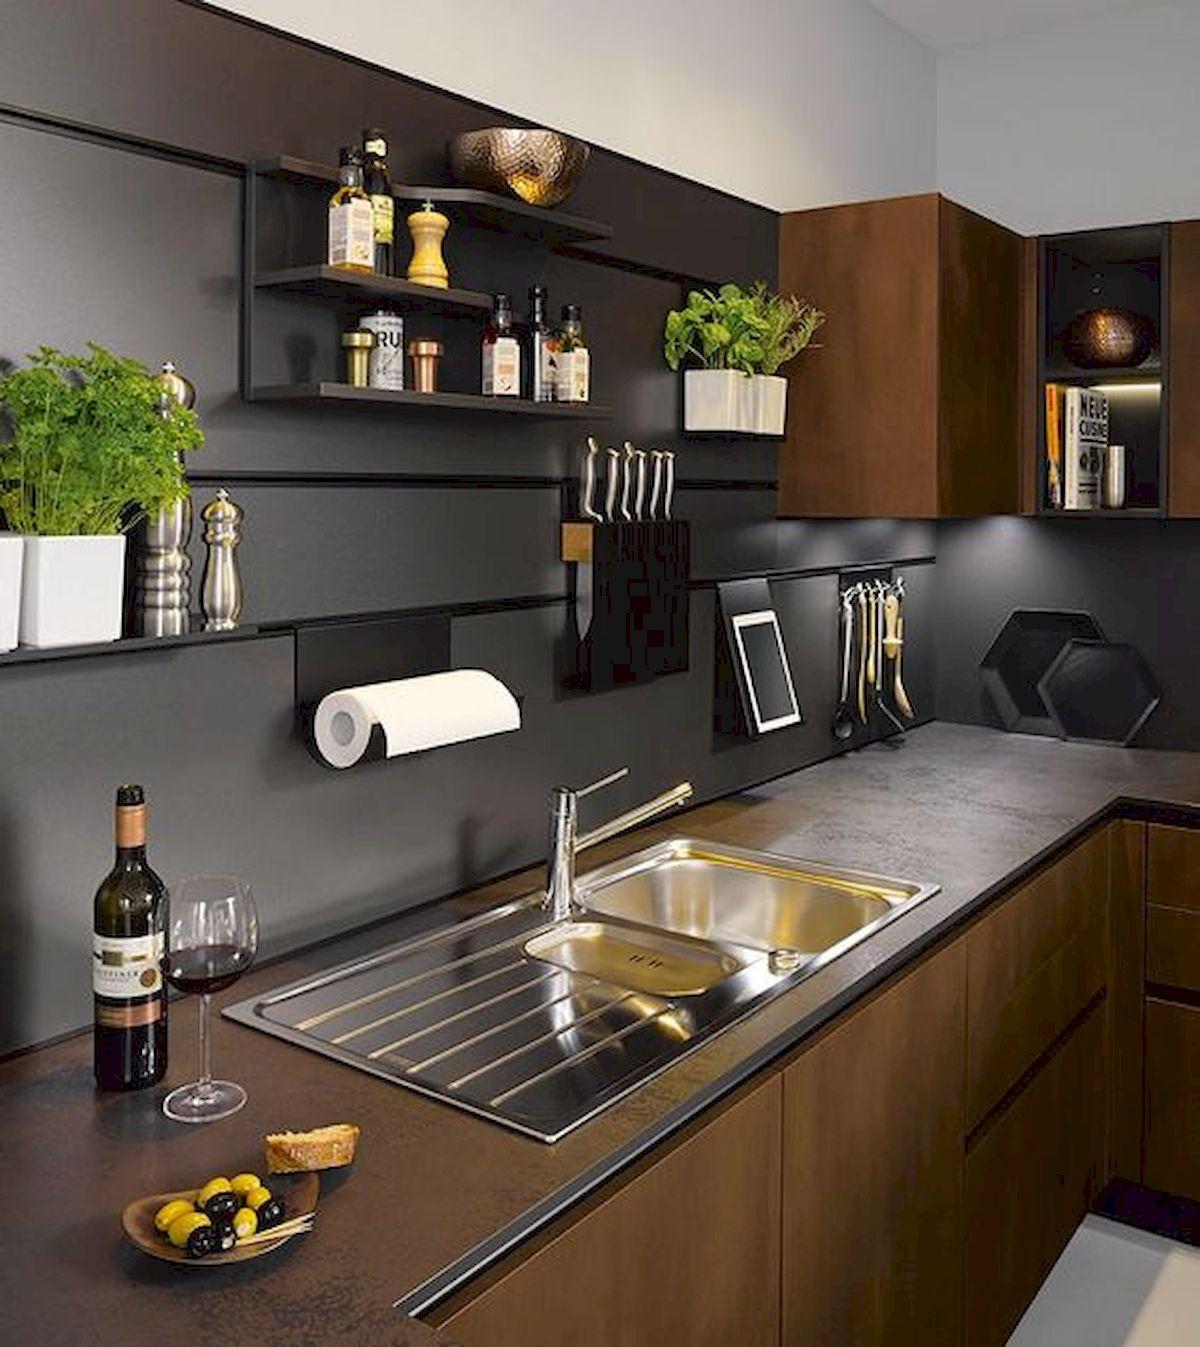 45 Easy Kitchen Decor and Design Ideas (16)